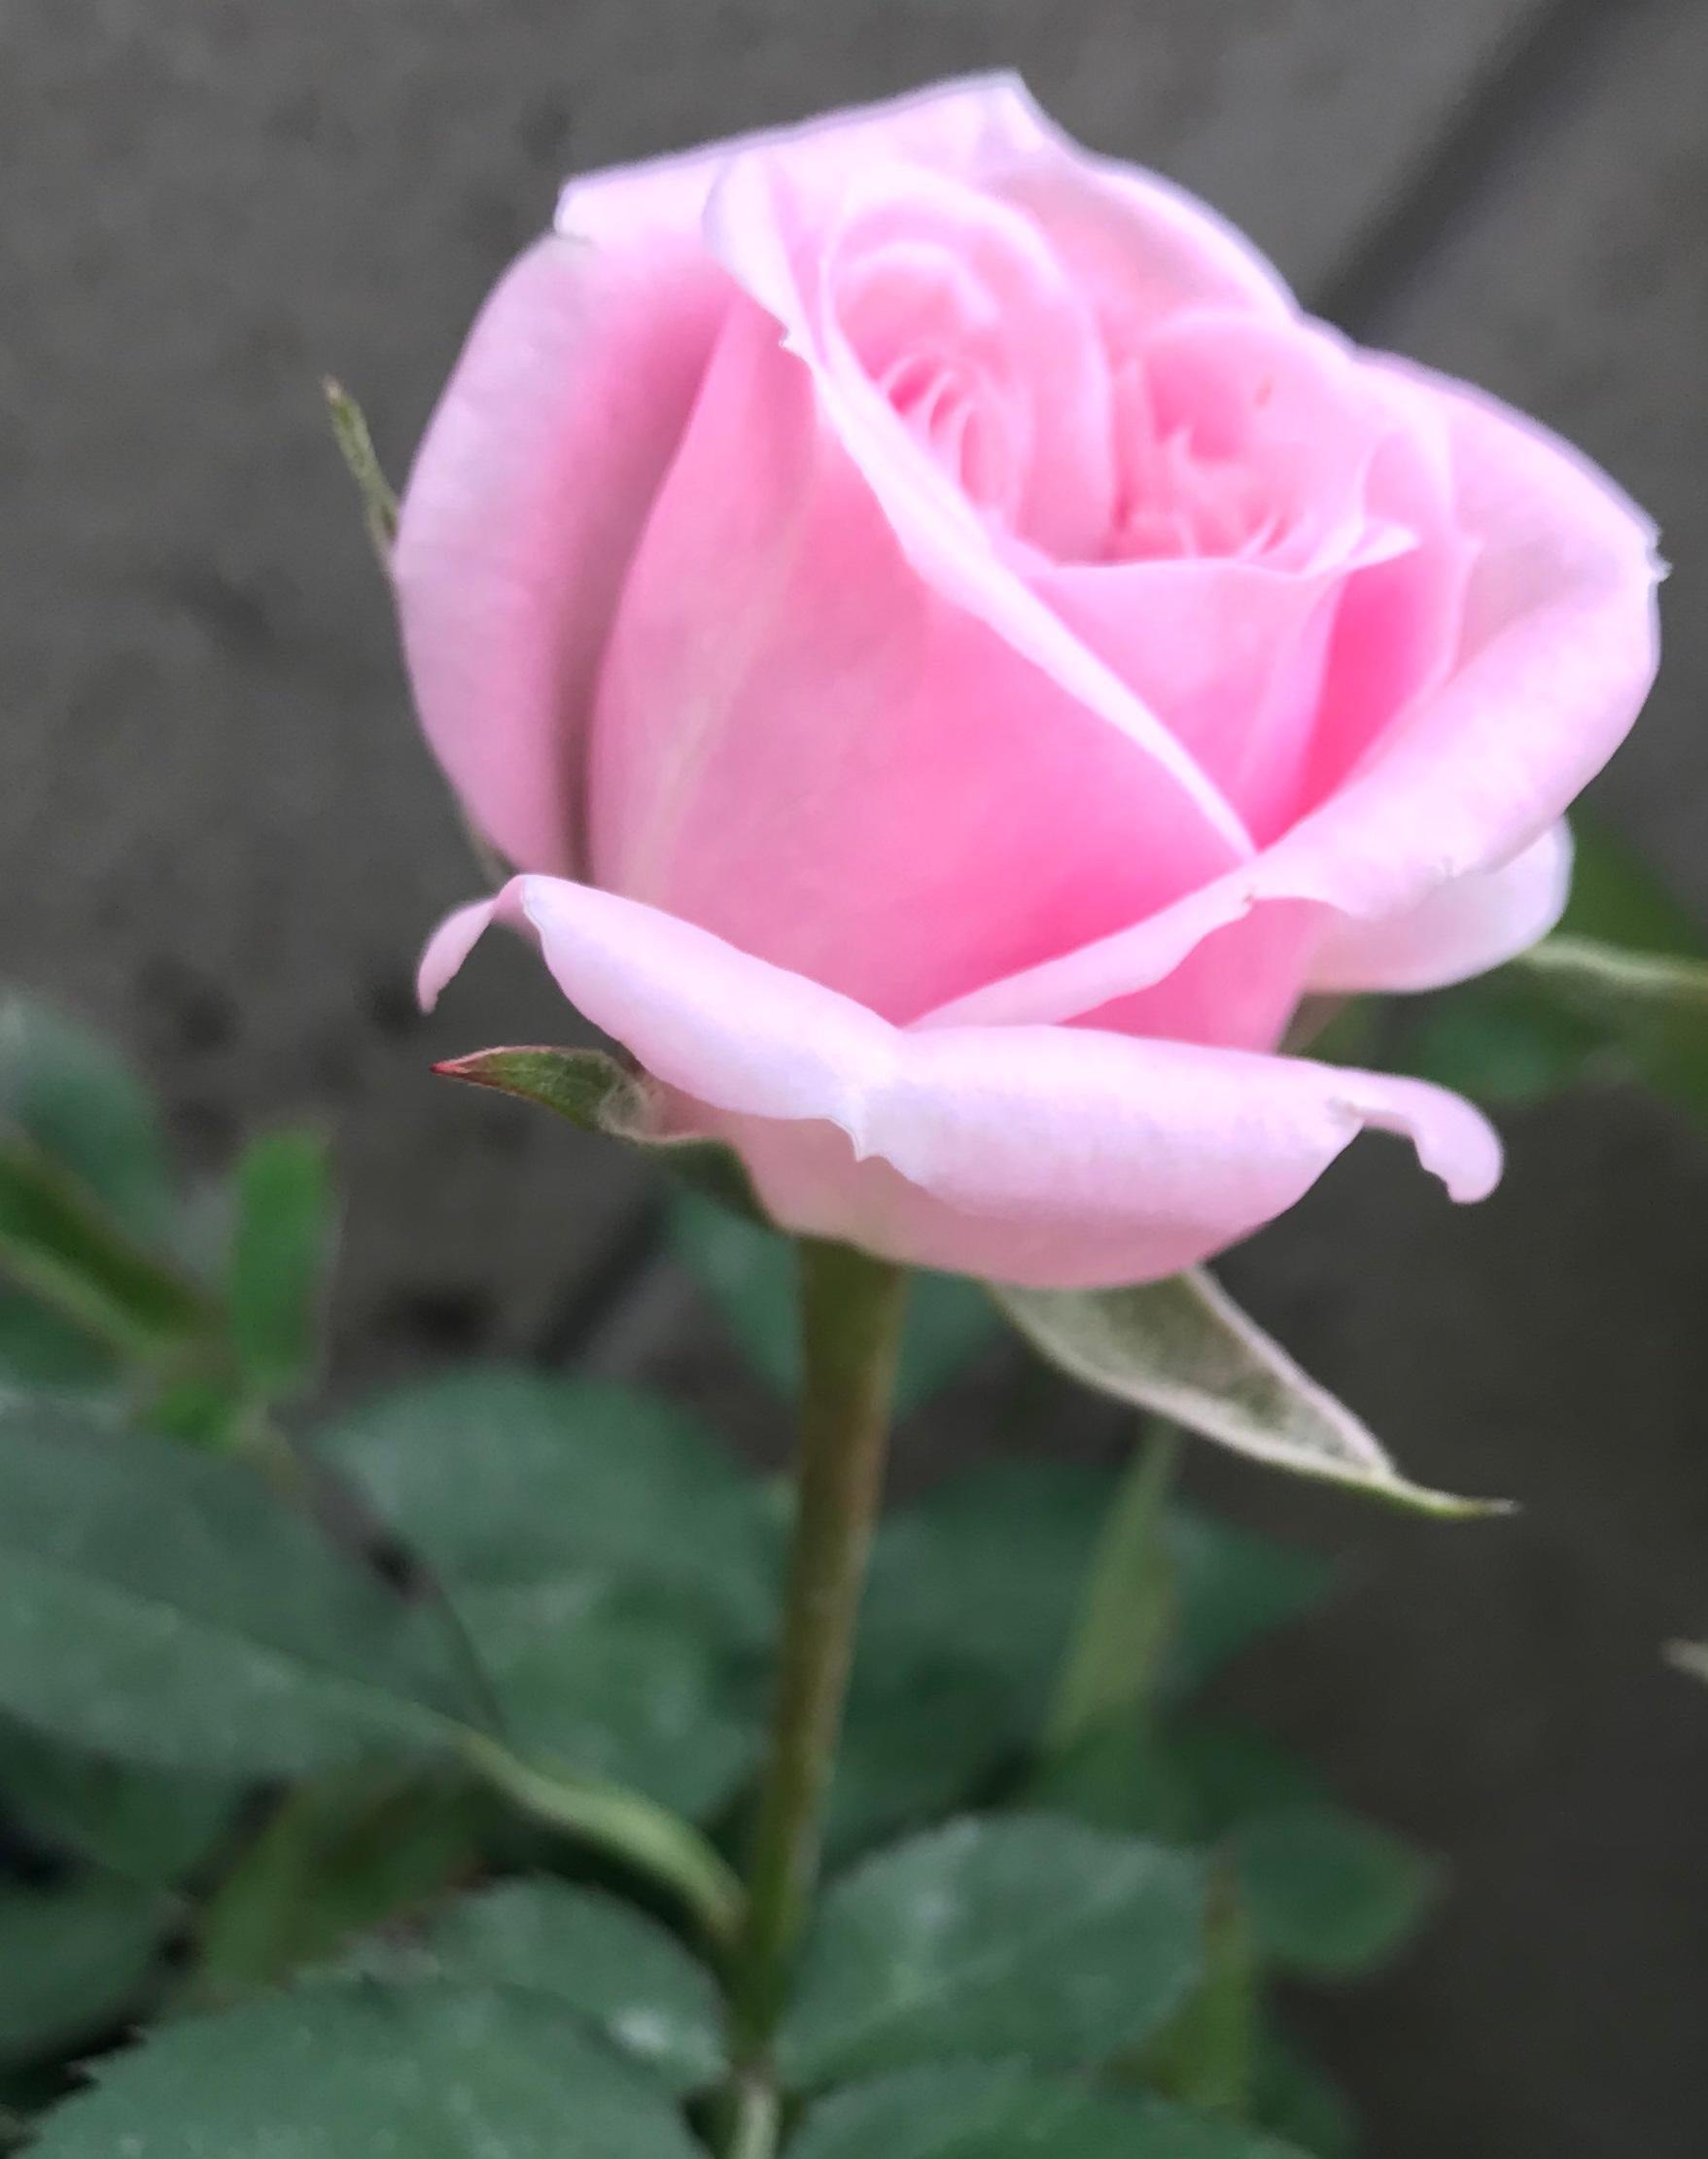 Rose amethyst